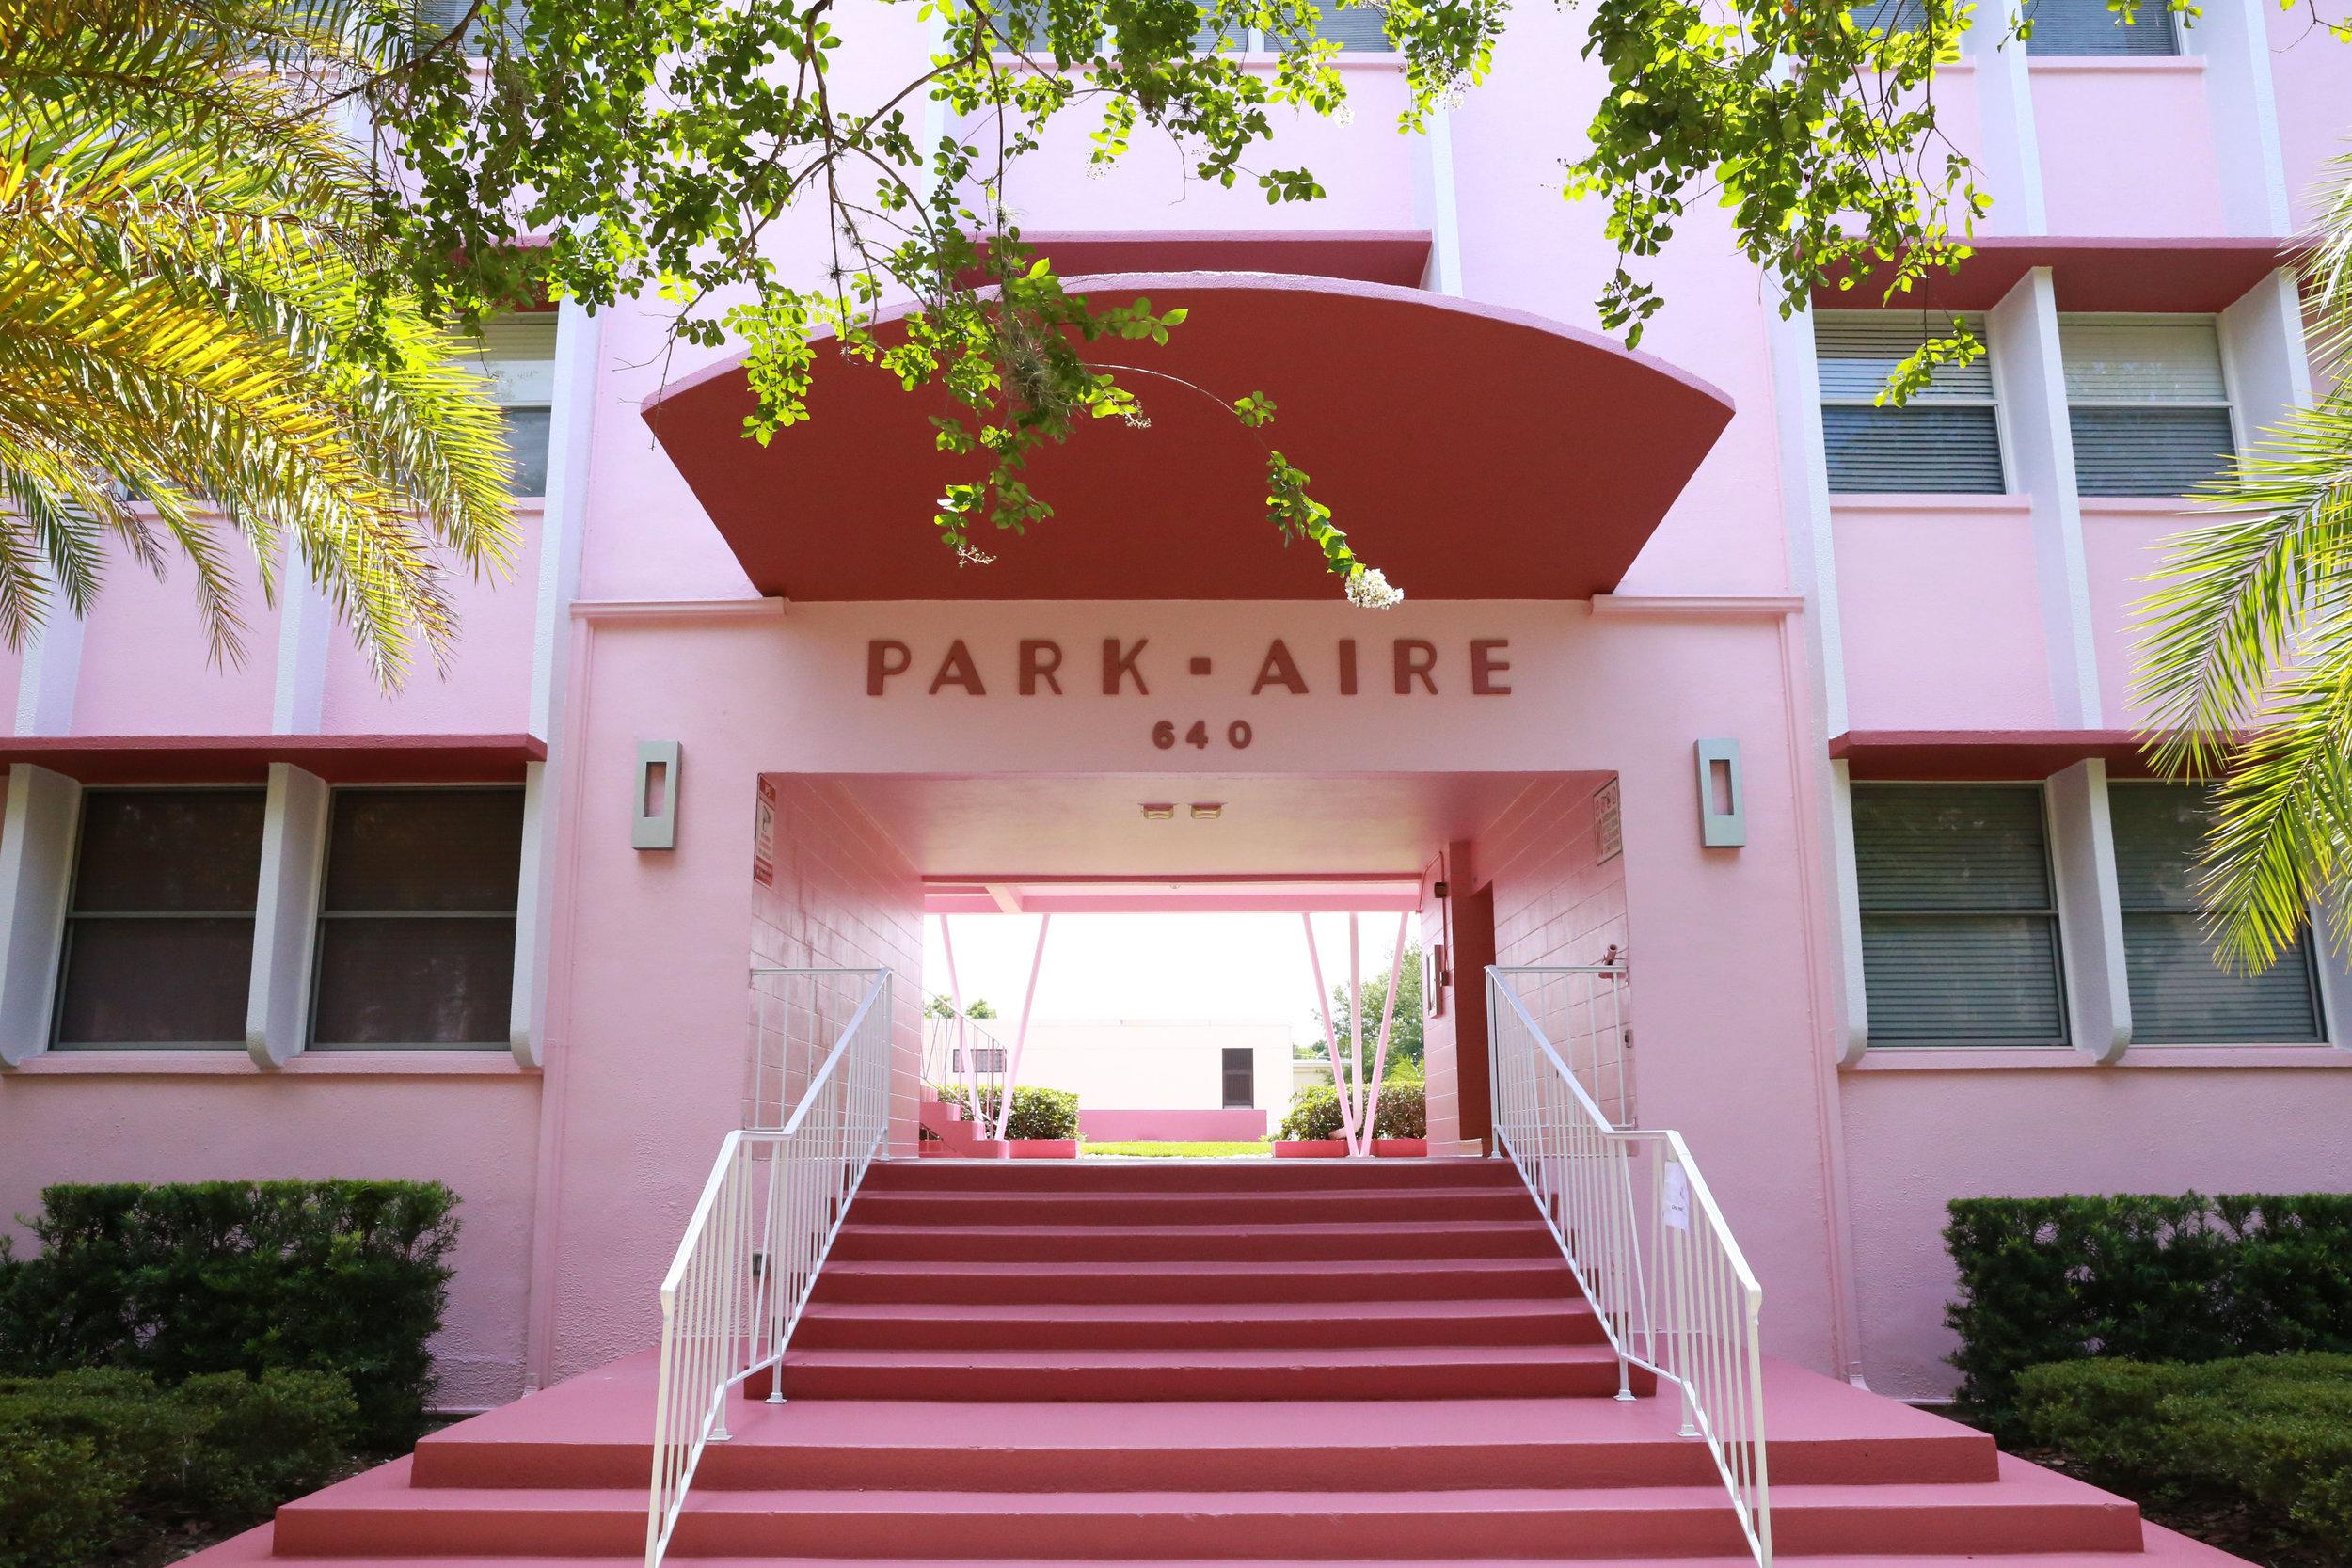 ParkAvePinkApartments.jpg